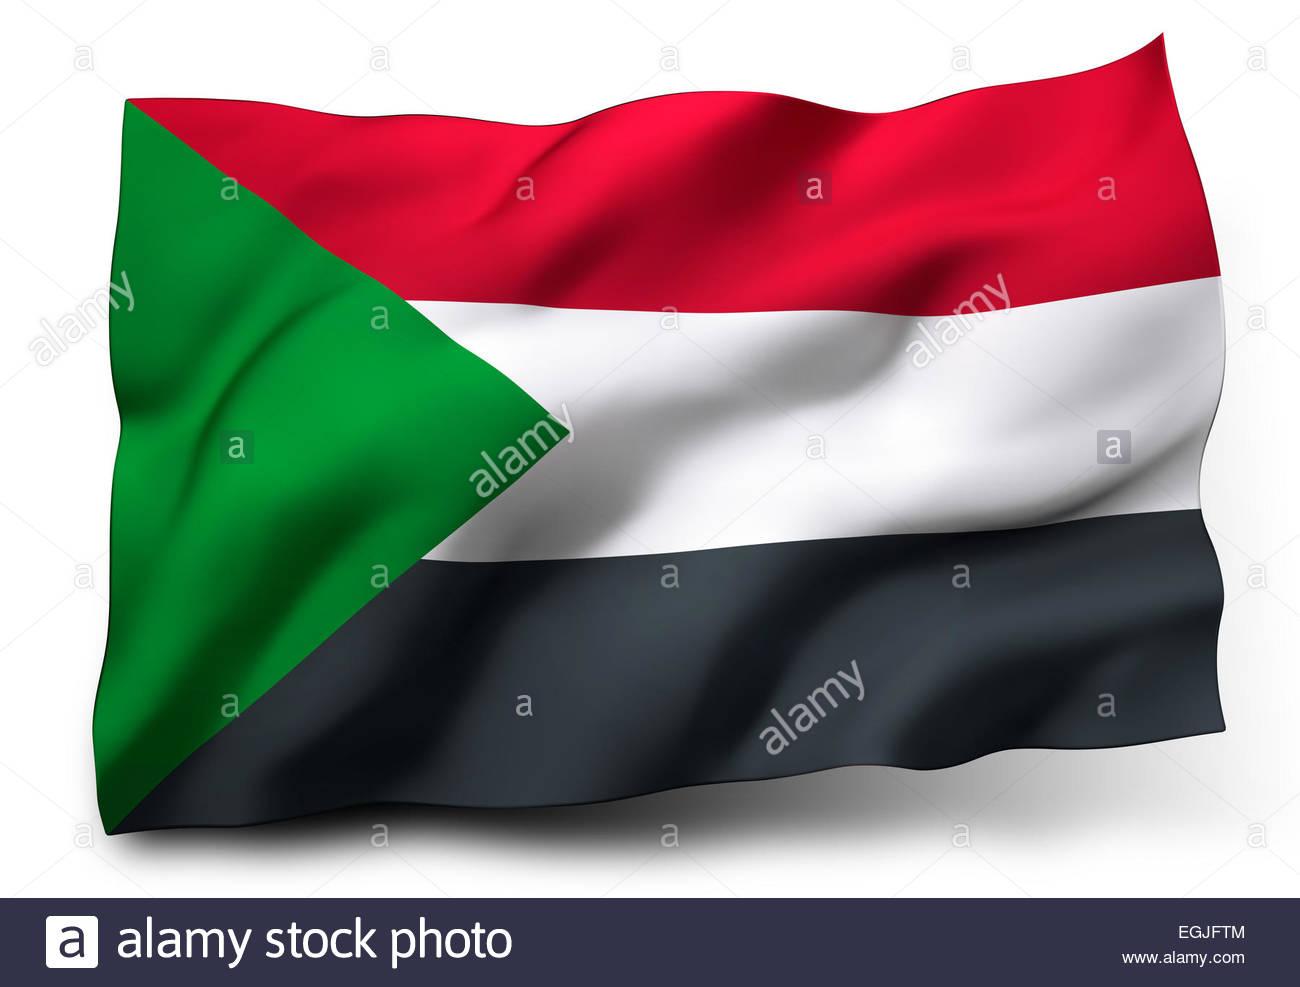 Waving flag of Sudan isolated on white background Stock Photo 1300x987